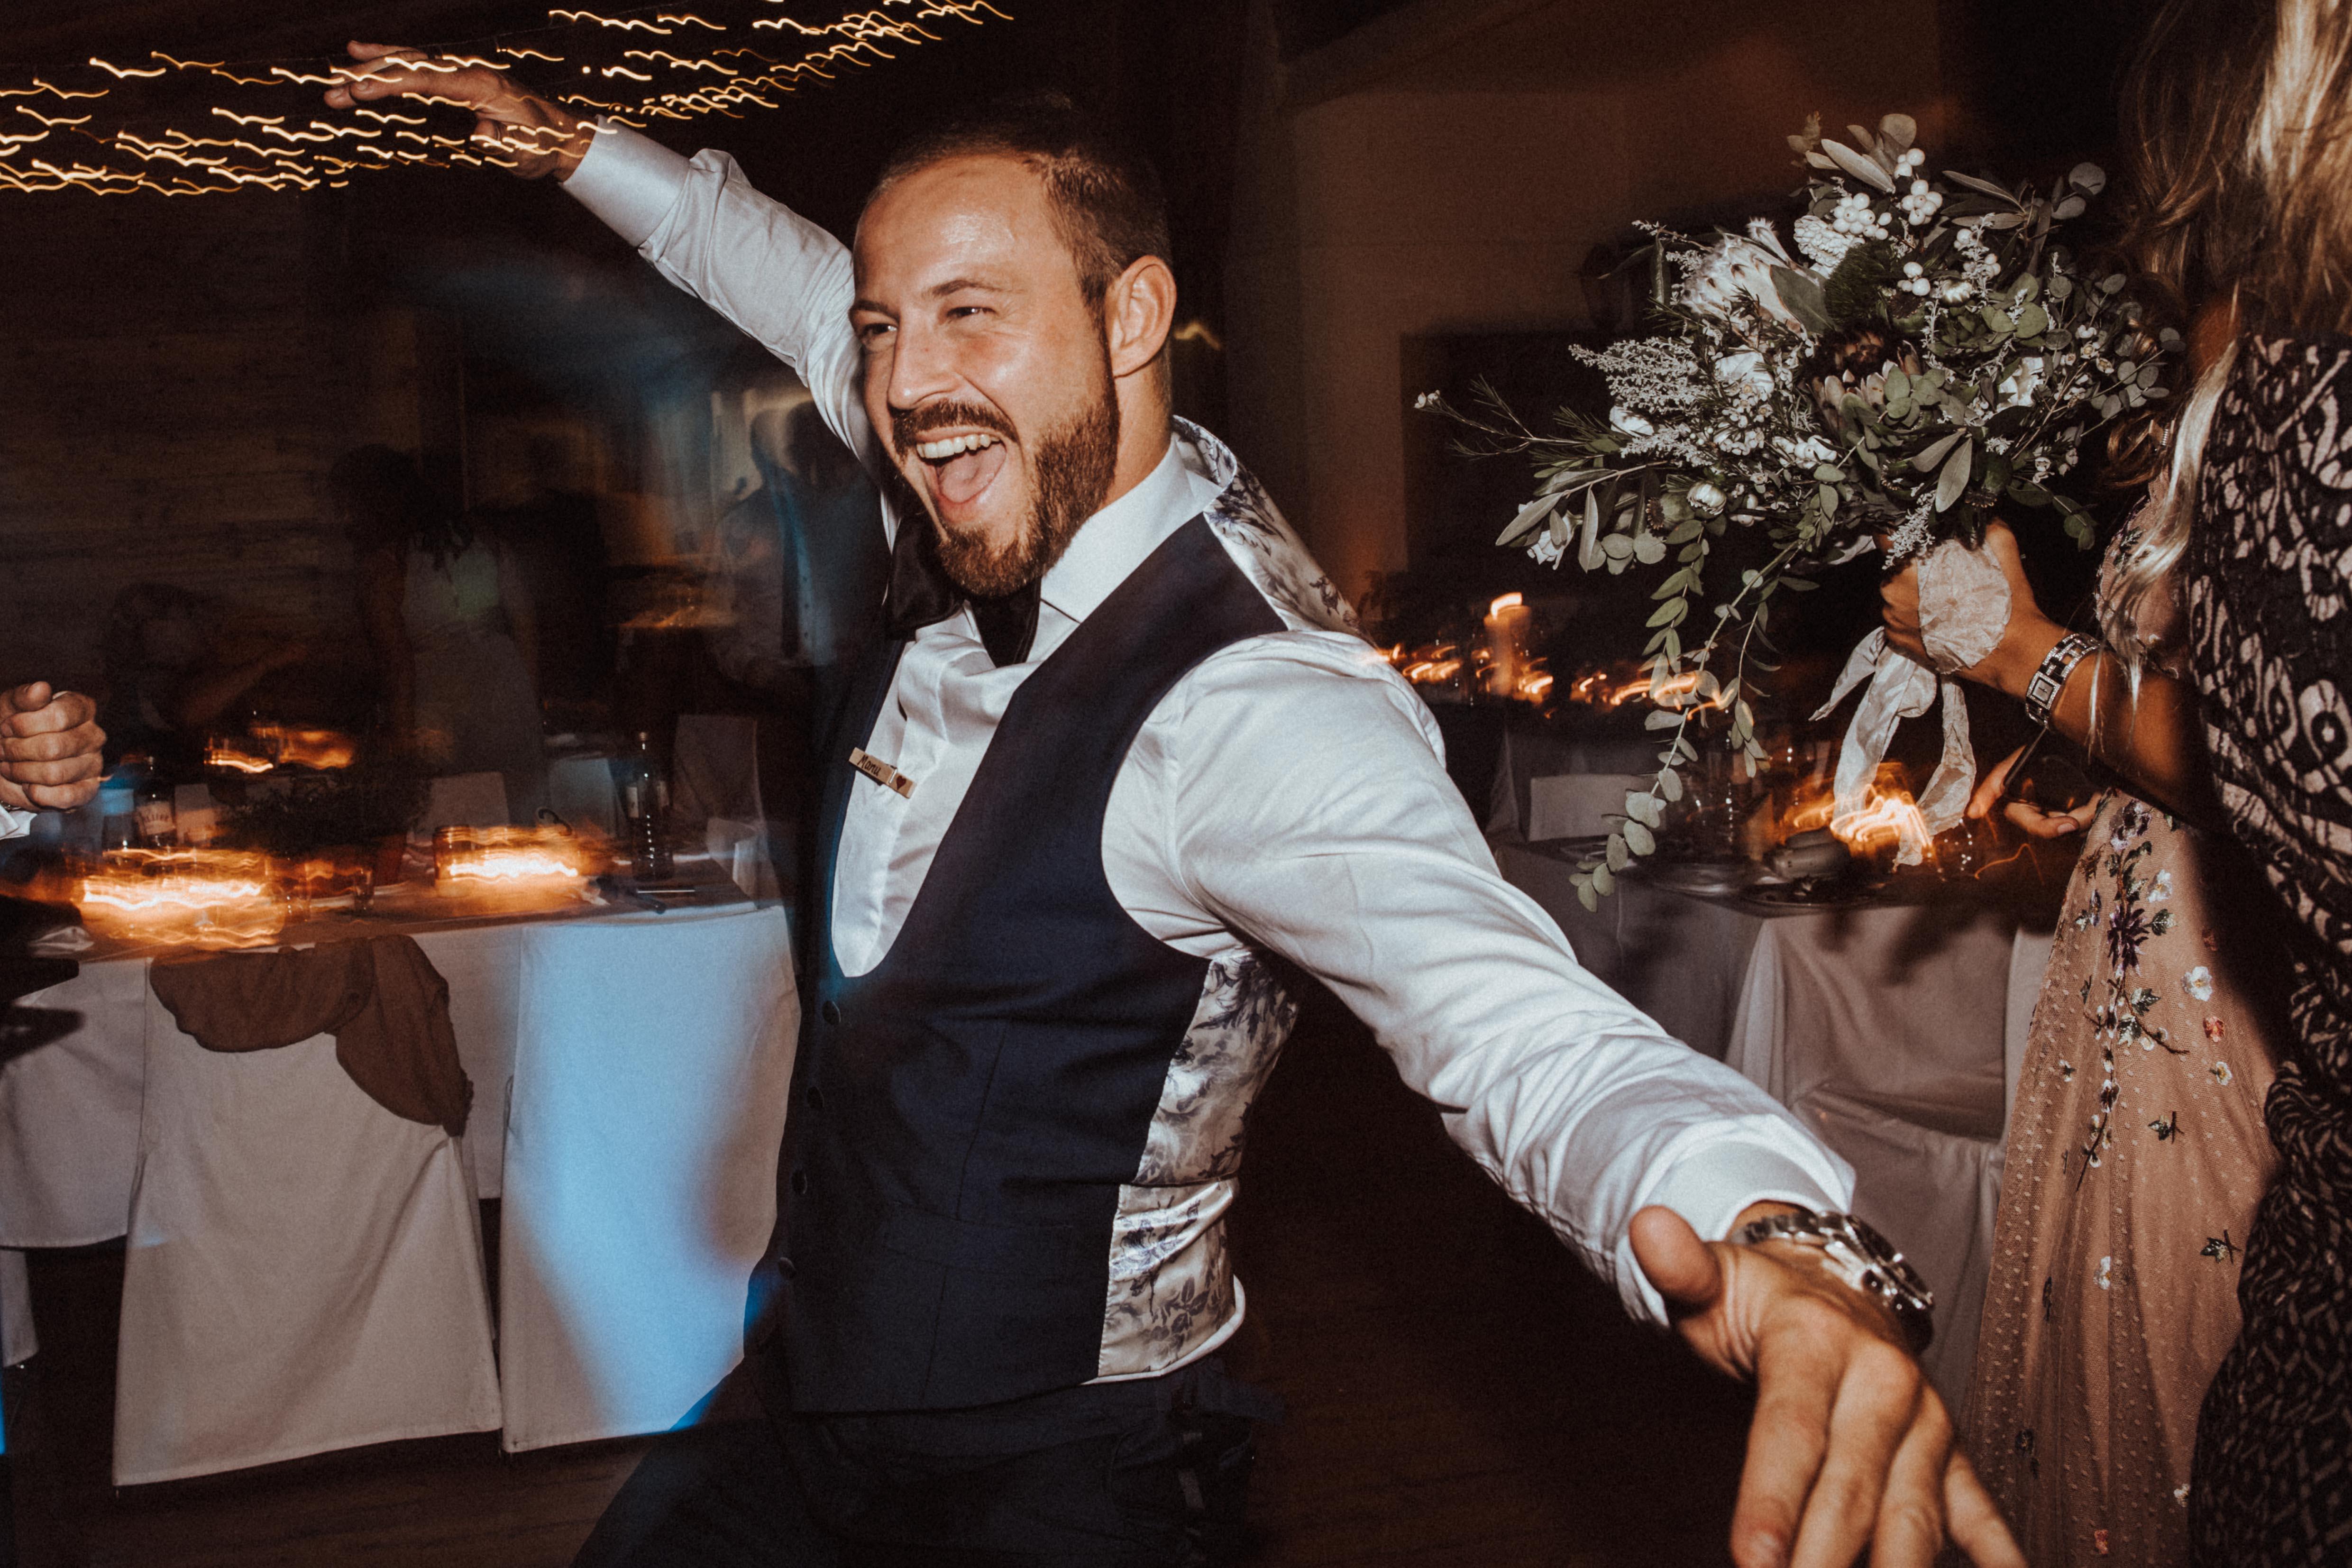 tänzer tanzen Sonja Pöhlmann Photography Wedding München Bayern